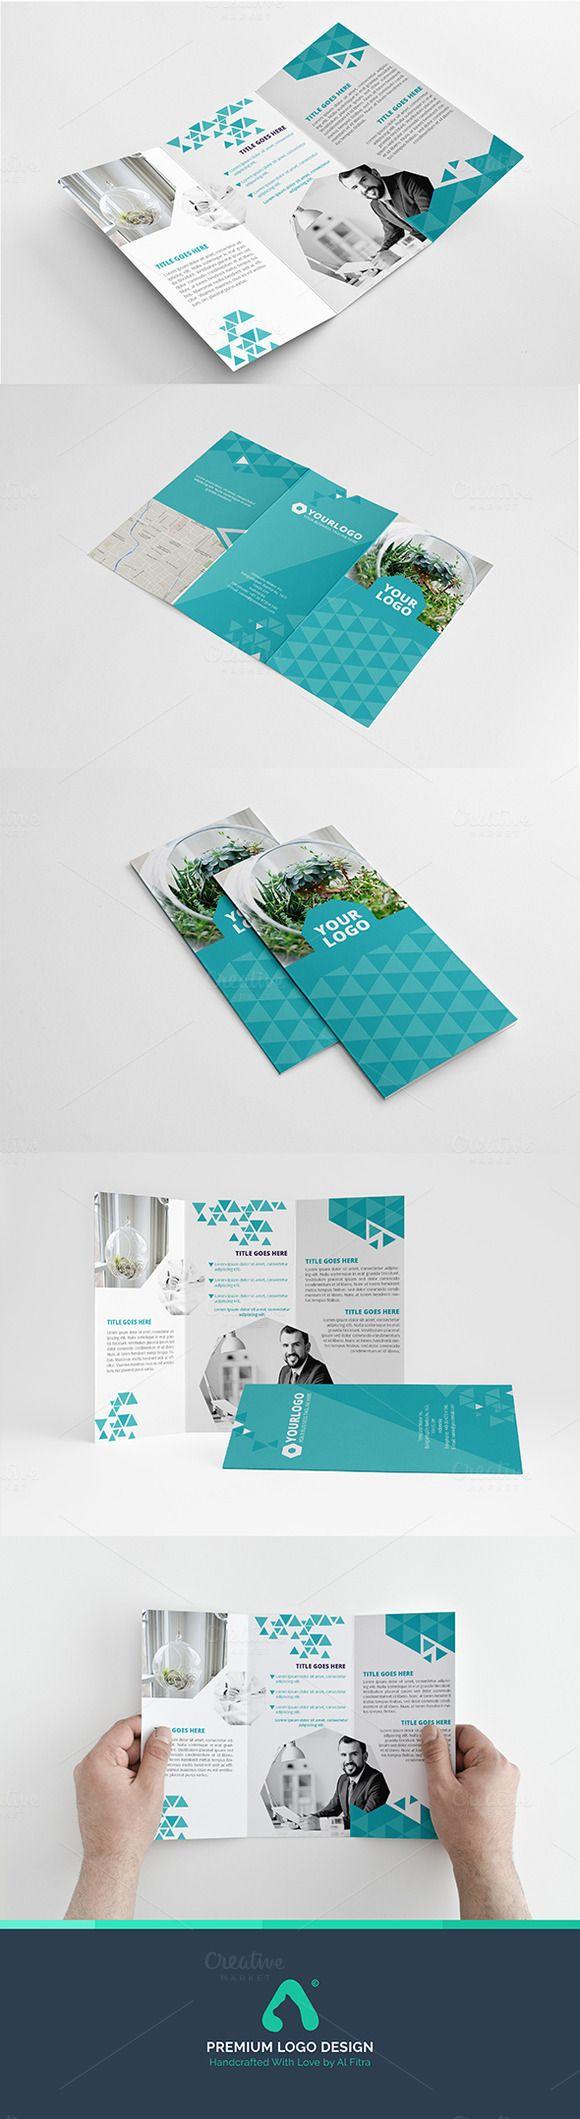 Toska Trifold Template by Al Fitra on Creative Market Flyer Design aus dem Kanto...